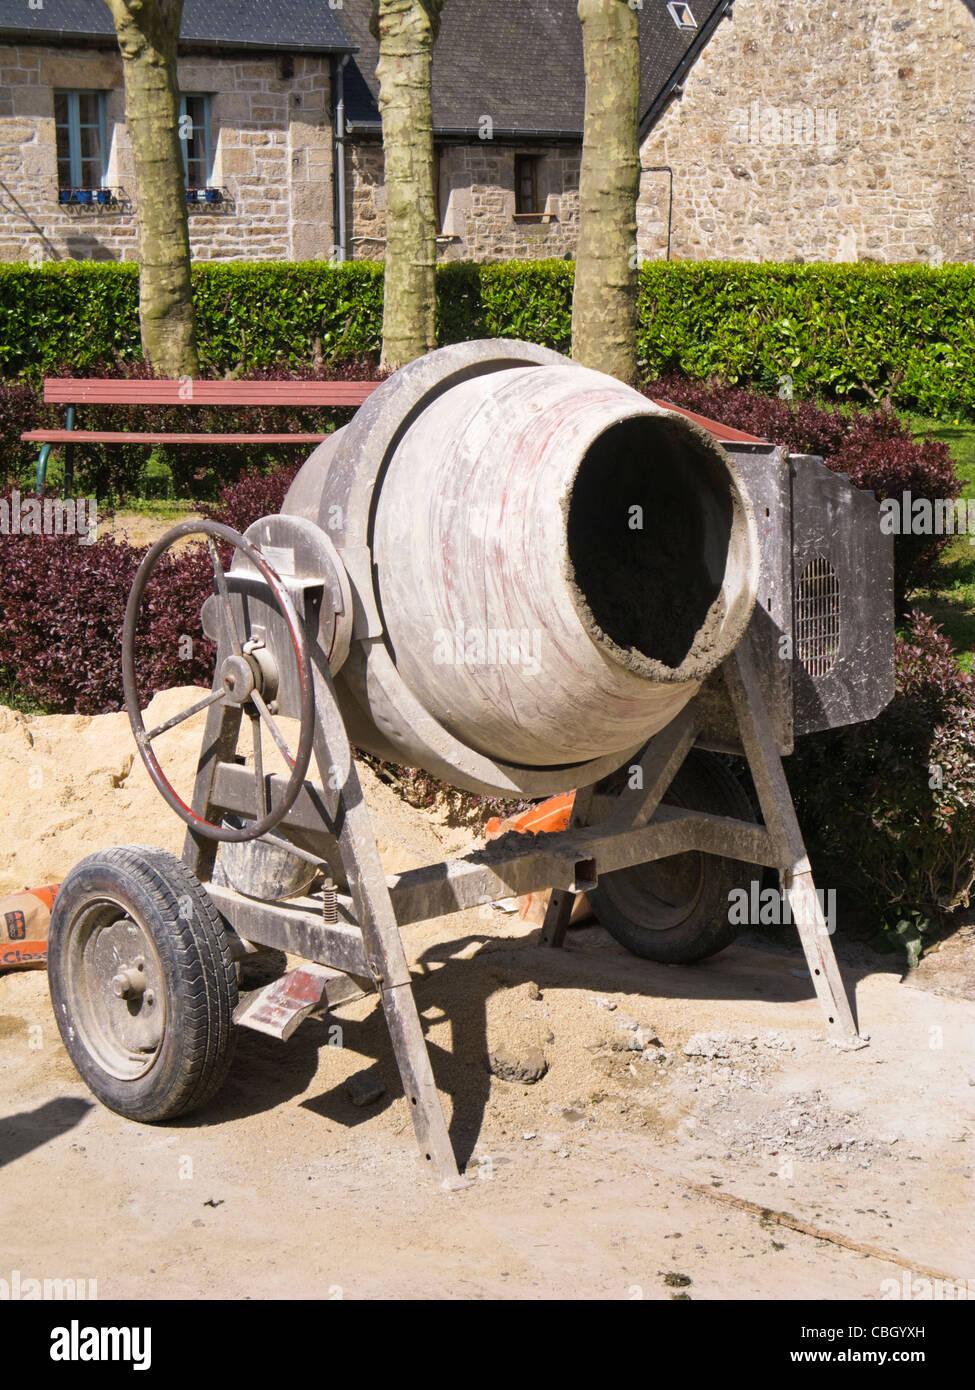 Cement mixer - Stock Image